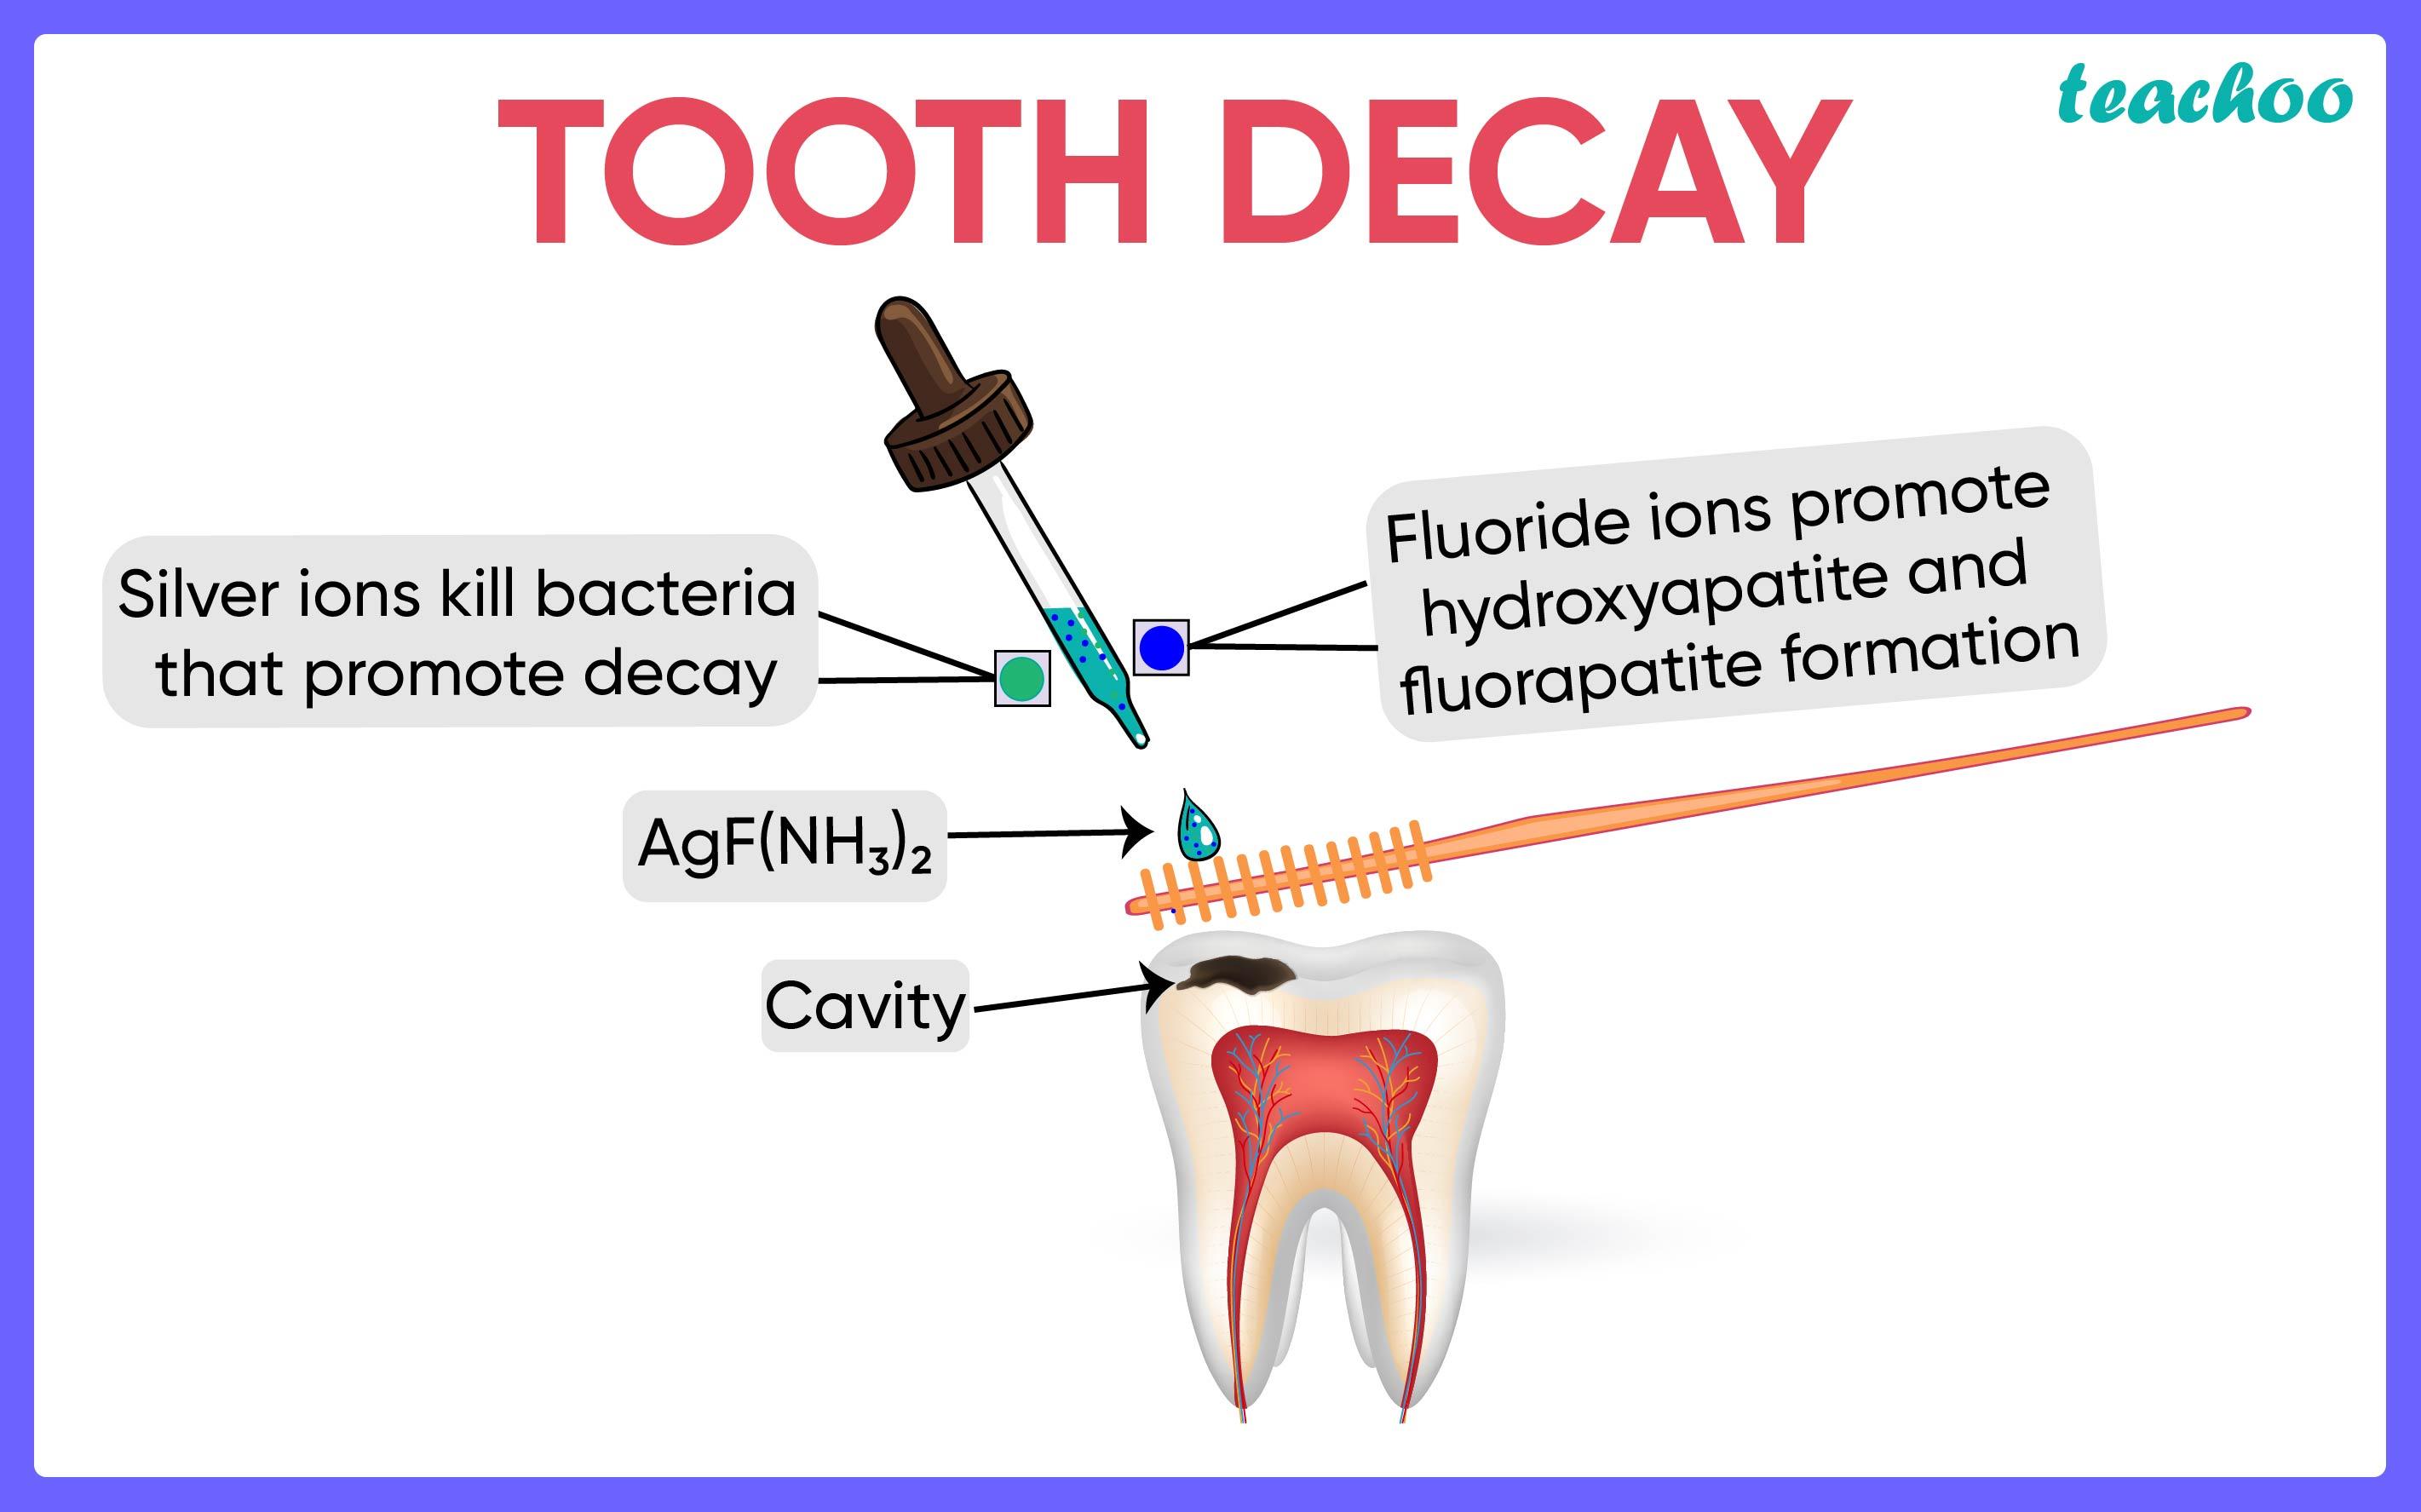 Tooth Decay-Teachoo.jpg